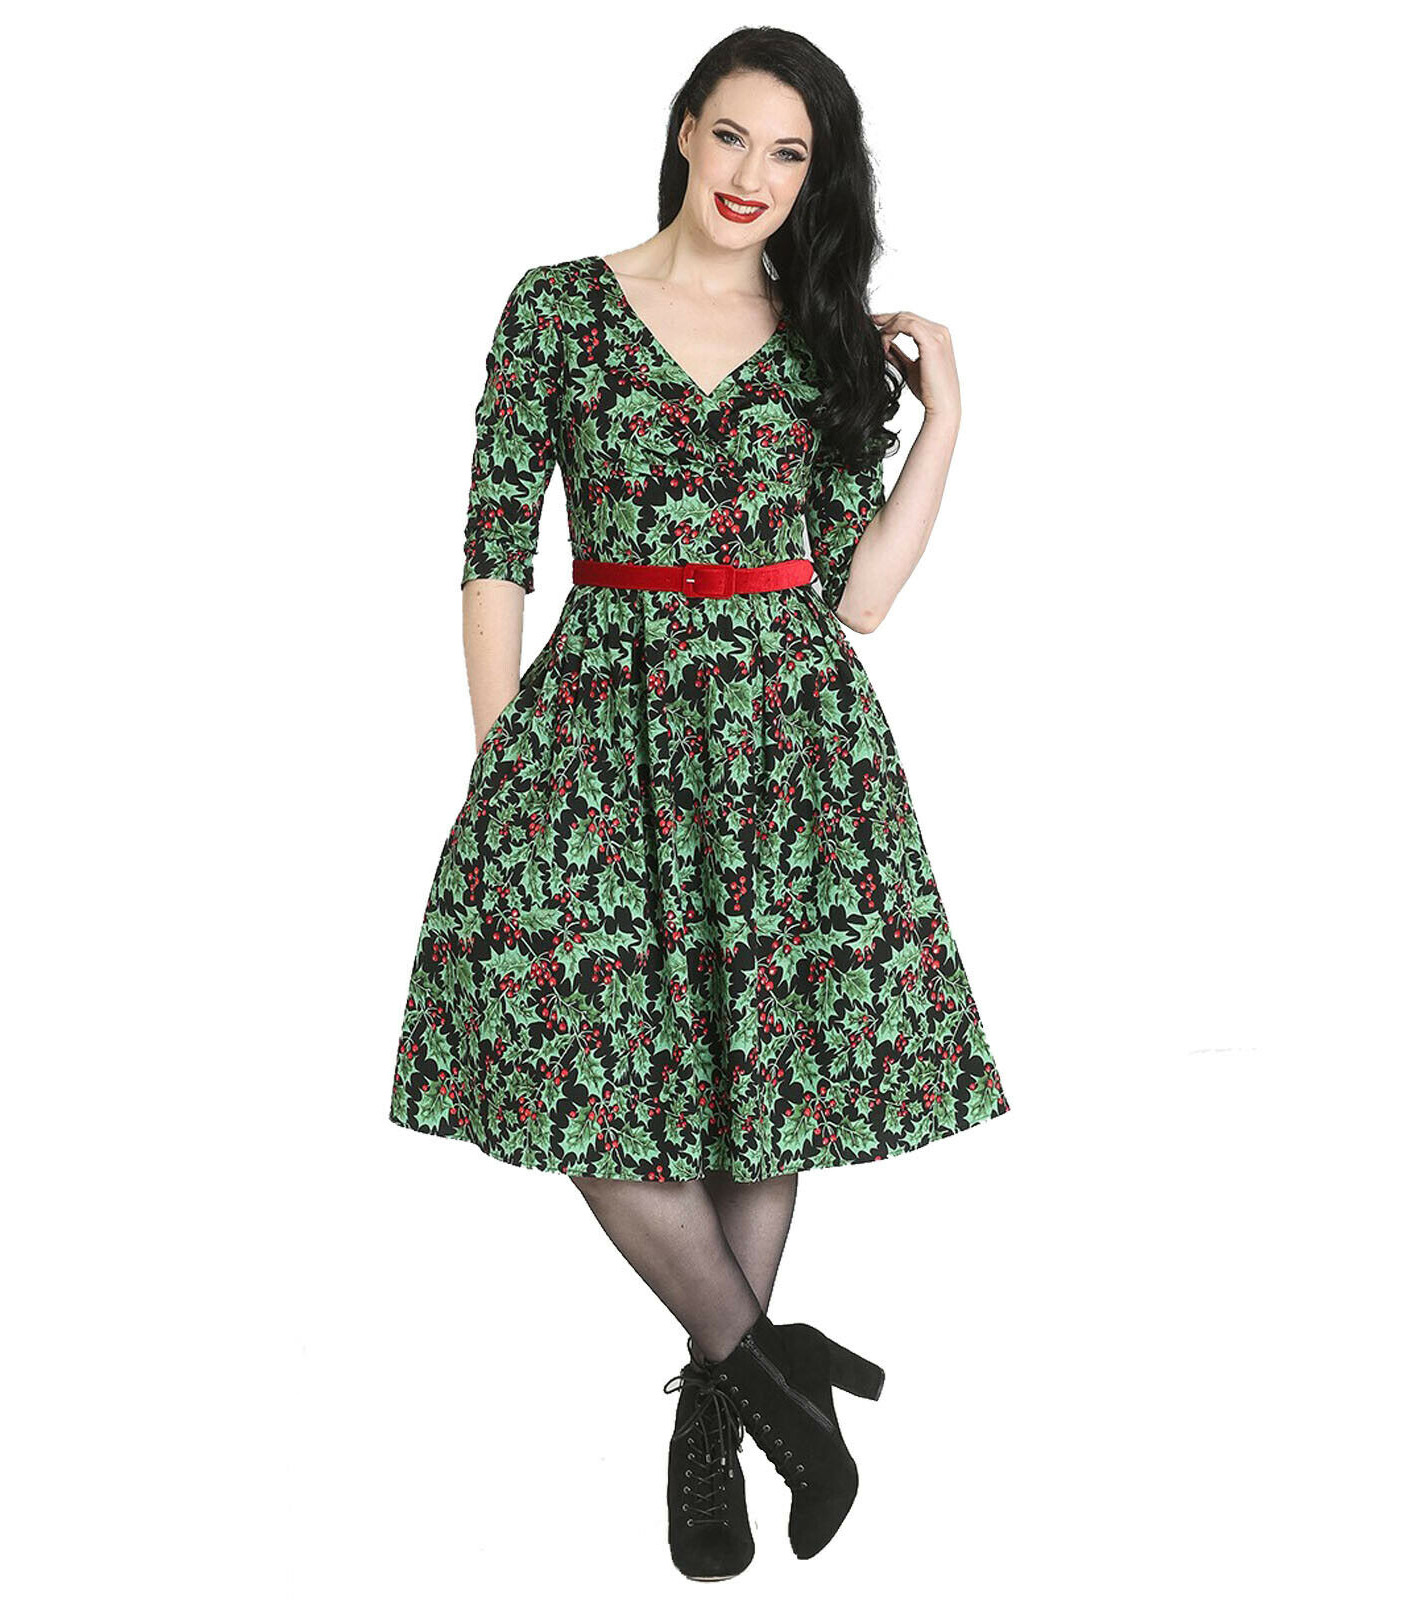 Hell-Bunny-50s-Pin-Up-Navidad-Vestido-Festivo-Rojo-Holly-Berry-Negro-Todos-los-Tamanos miniatura 23